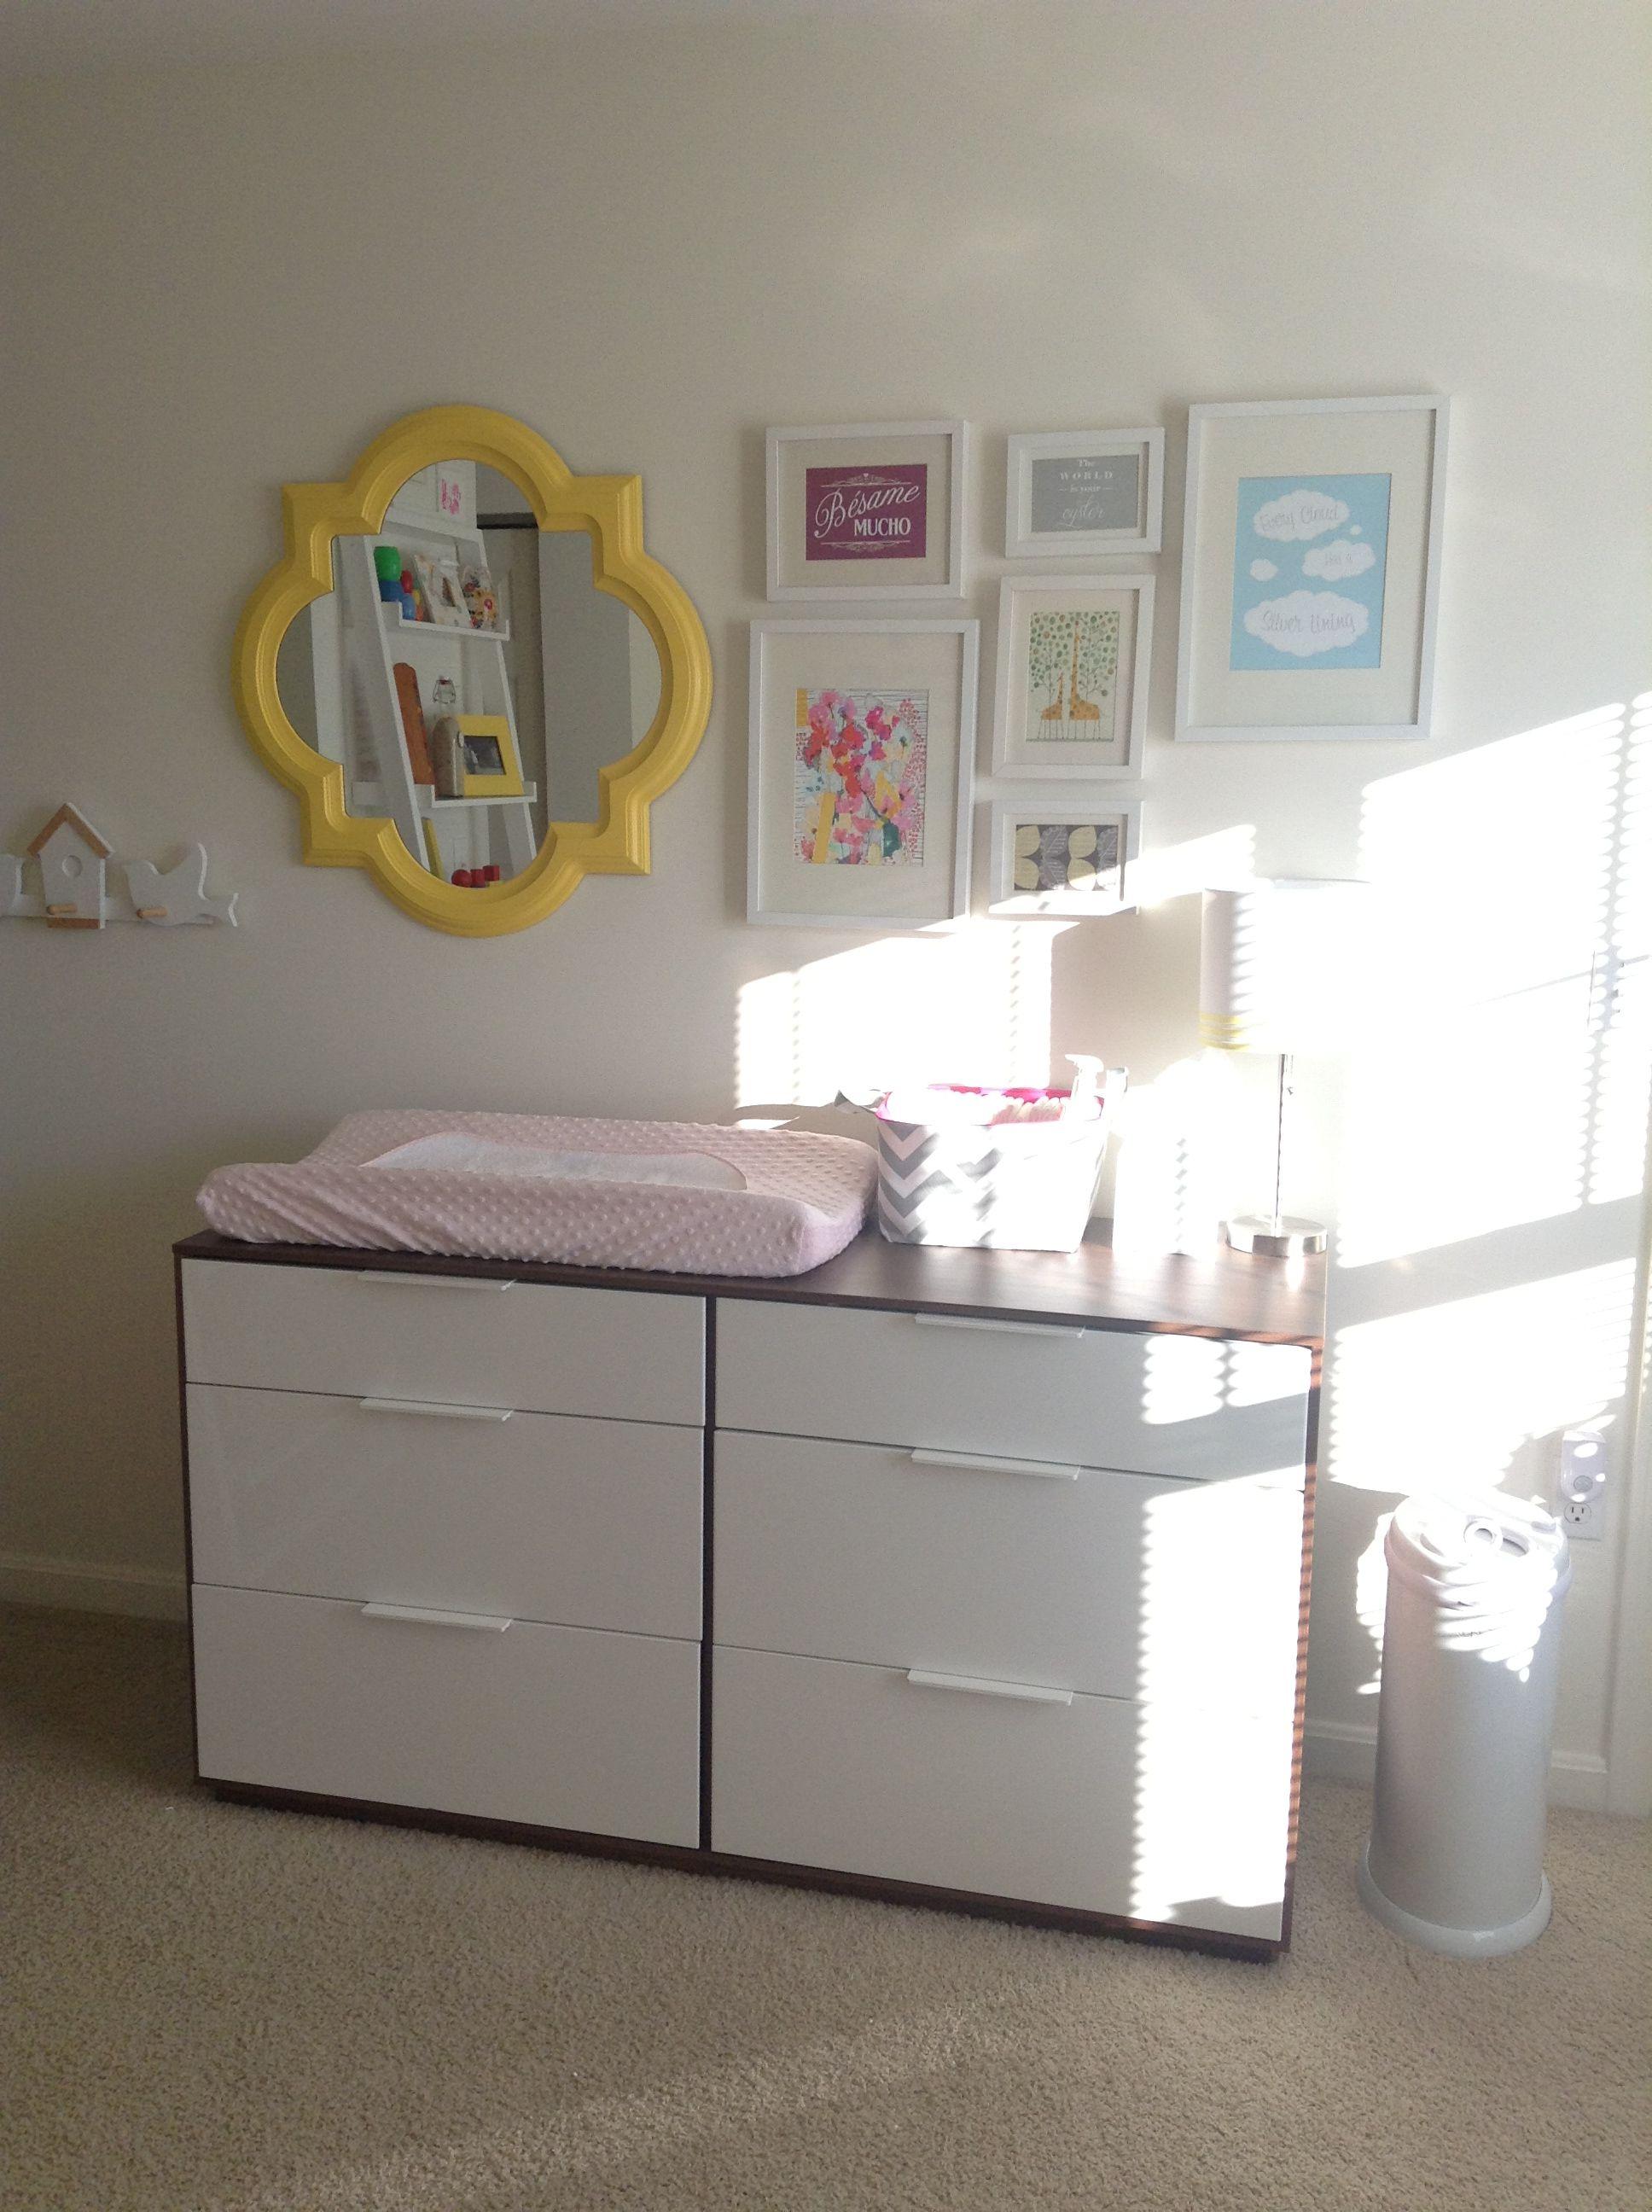 Tessa's modern nursery  Ikea Ribba frames  Art from Etsy or DIY